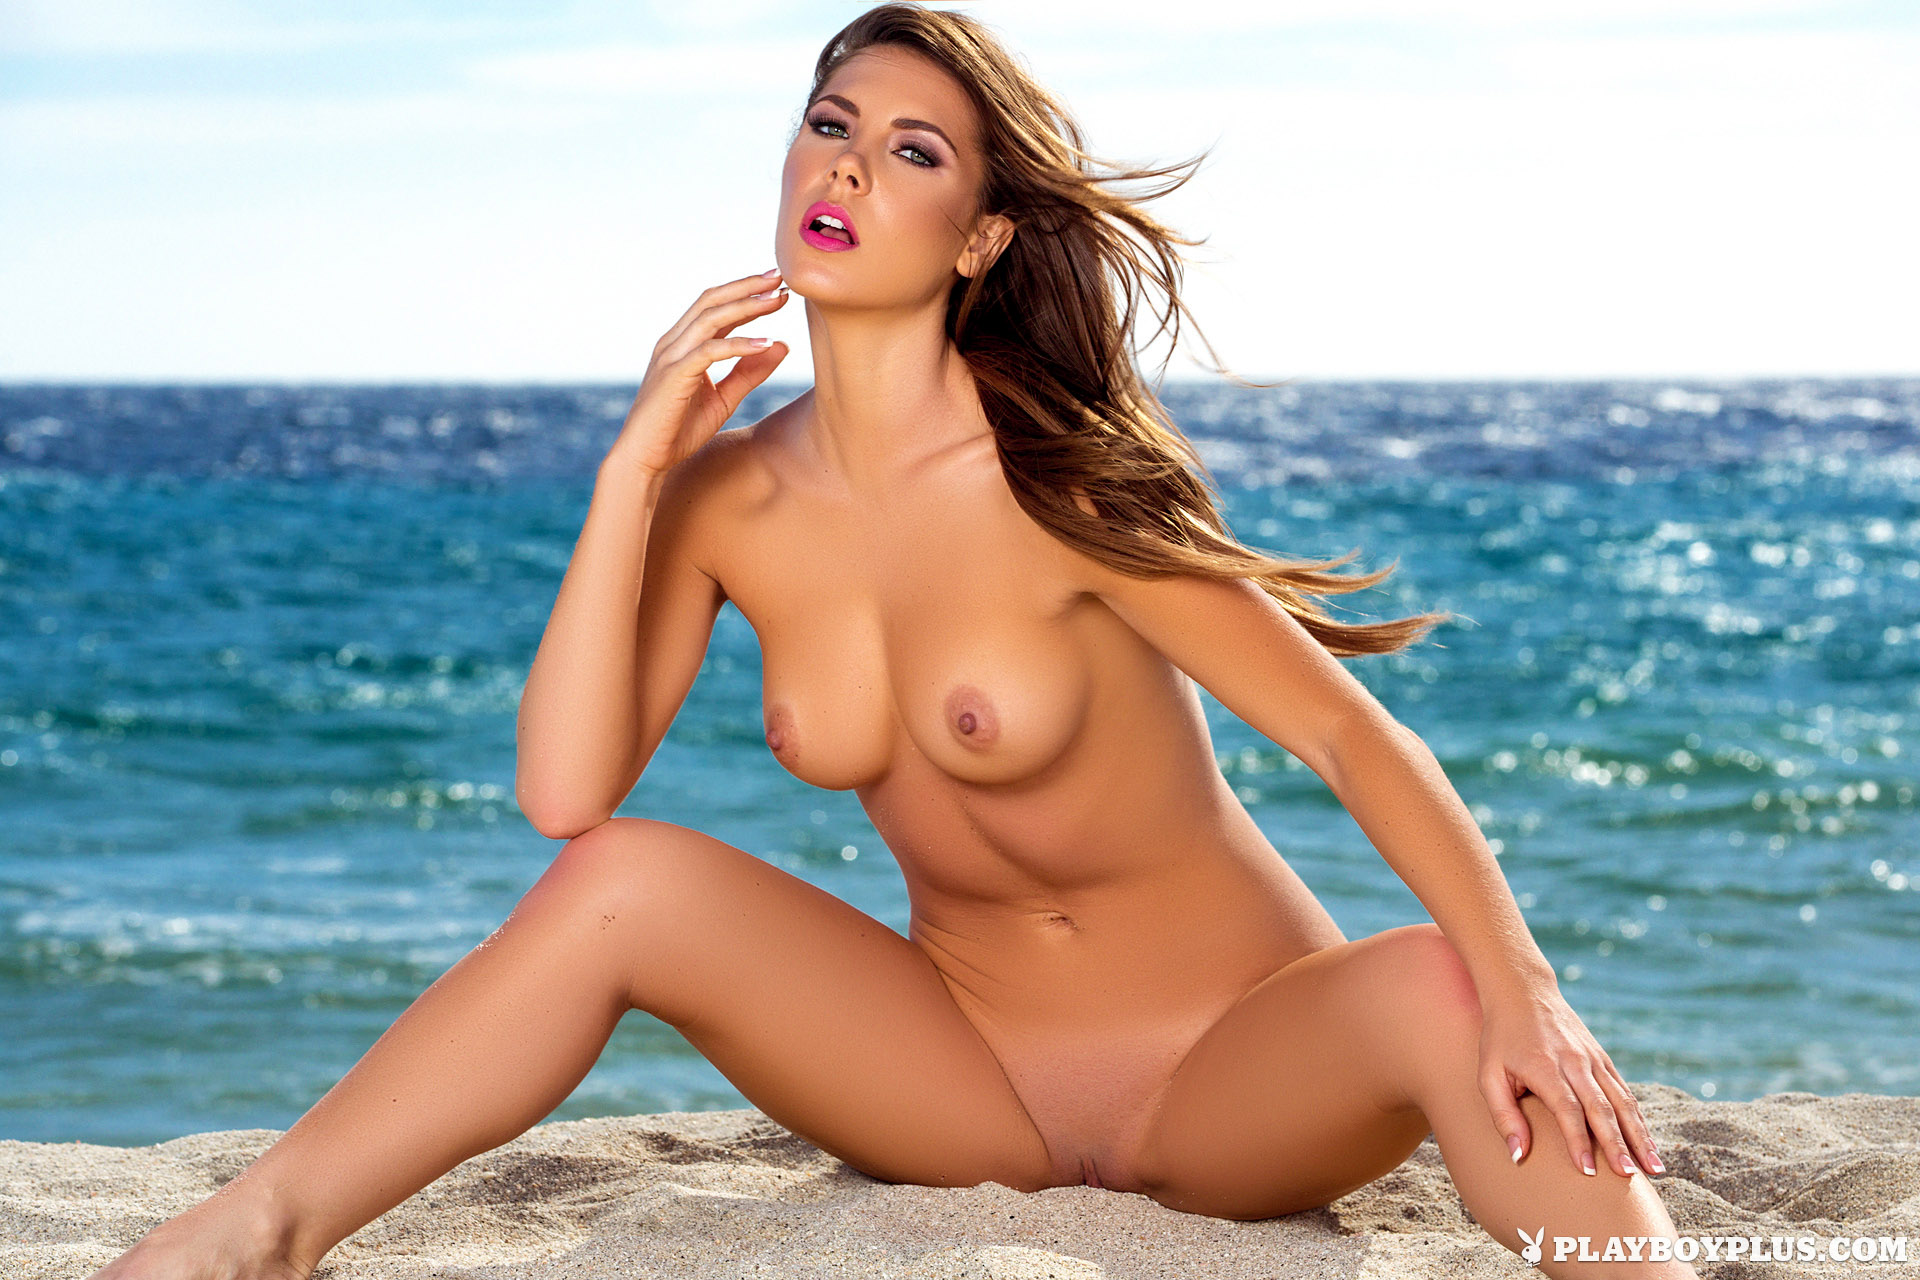 Gallery Nude Beach